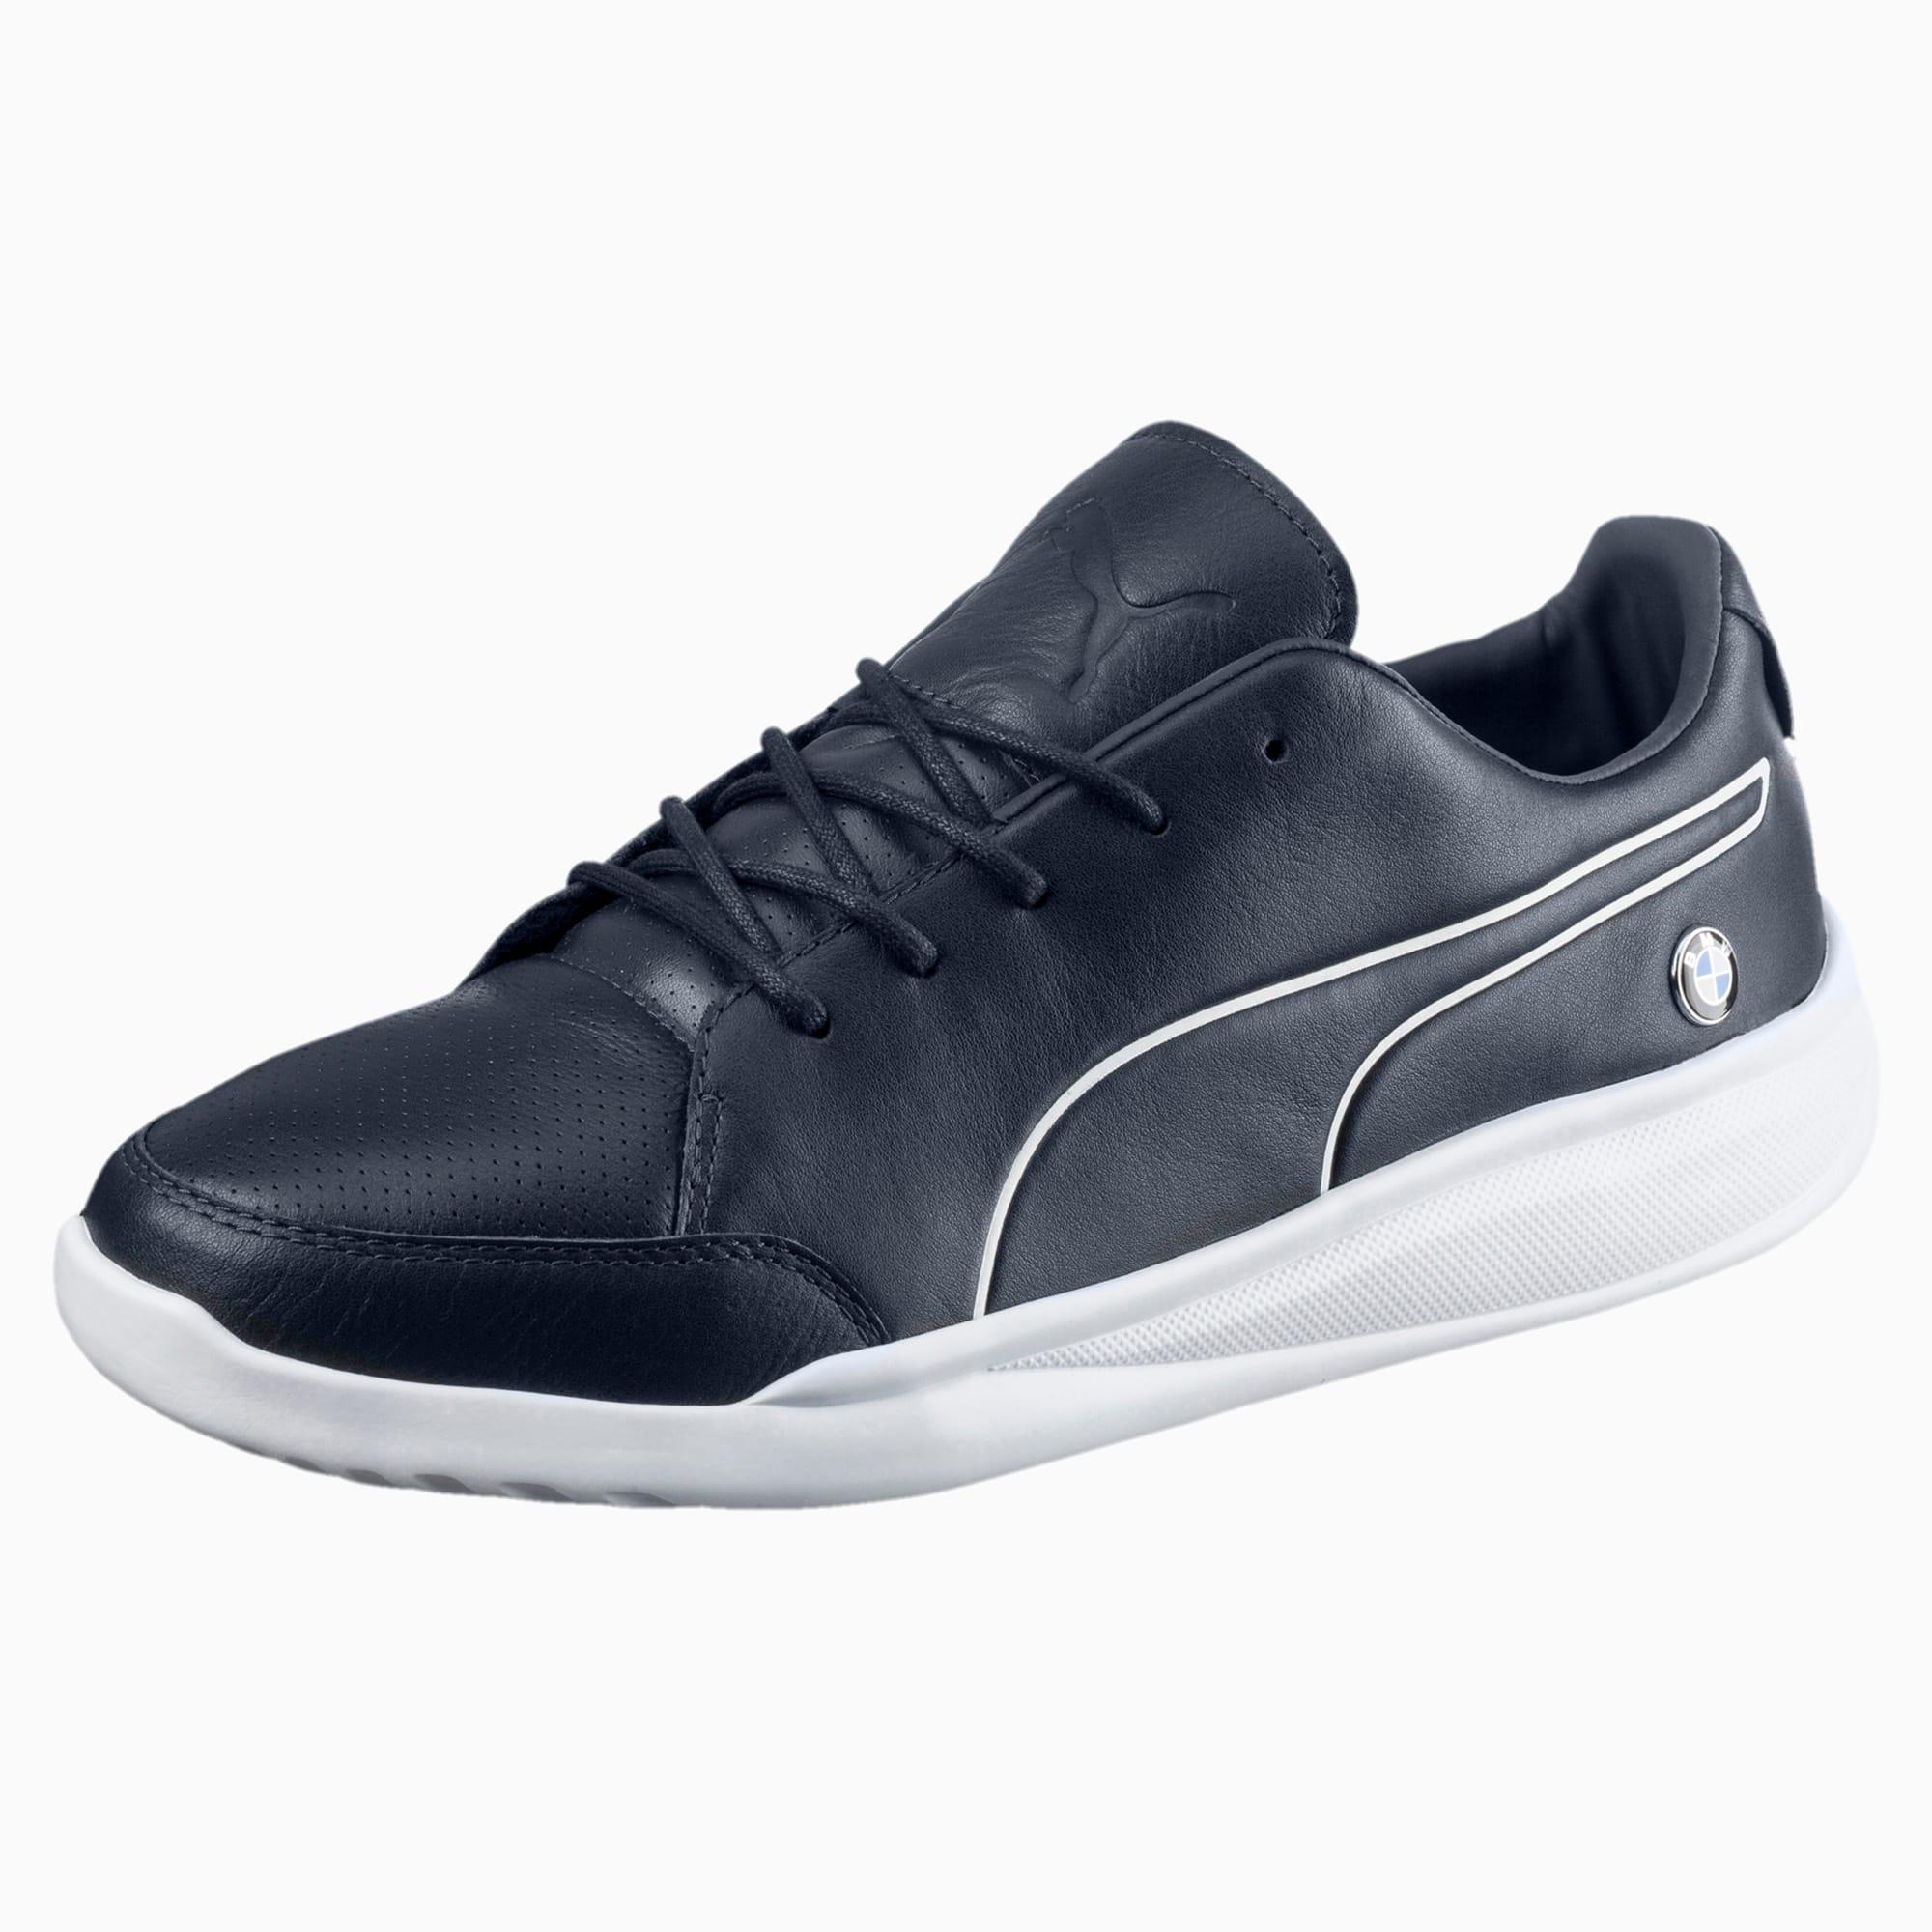 puma bmw casual shoes